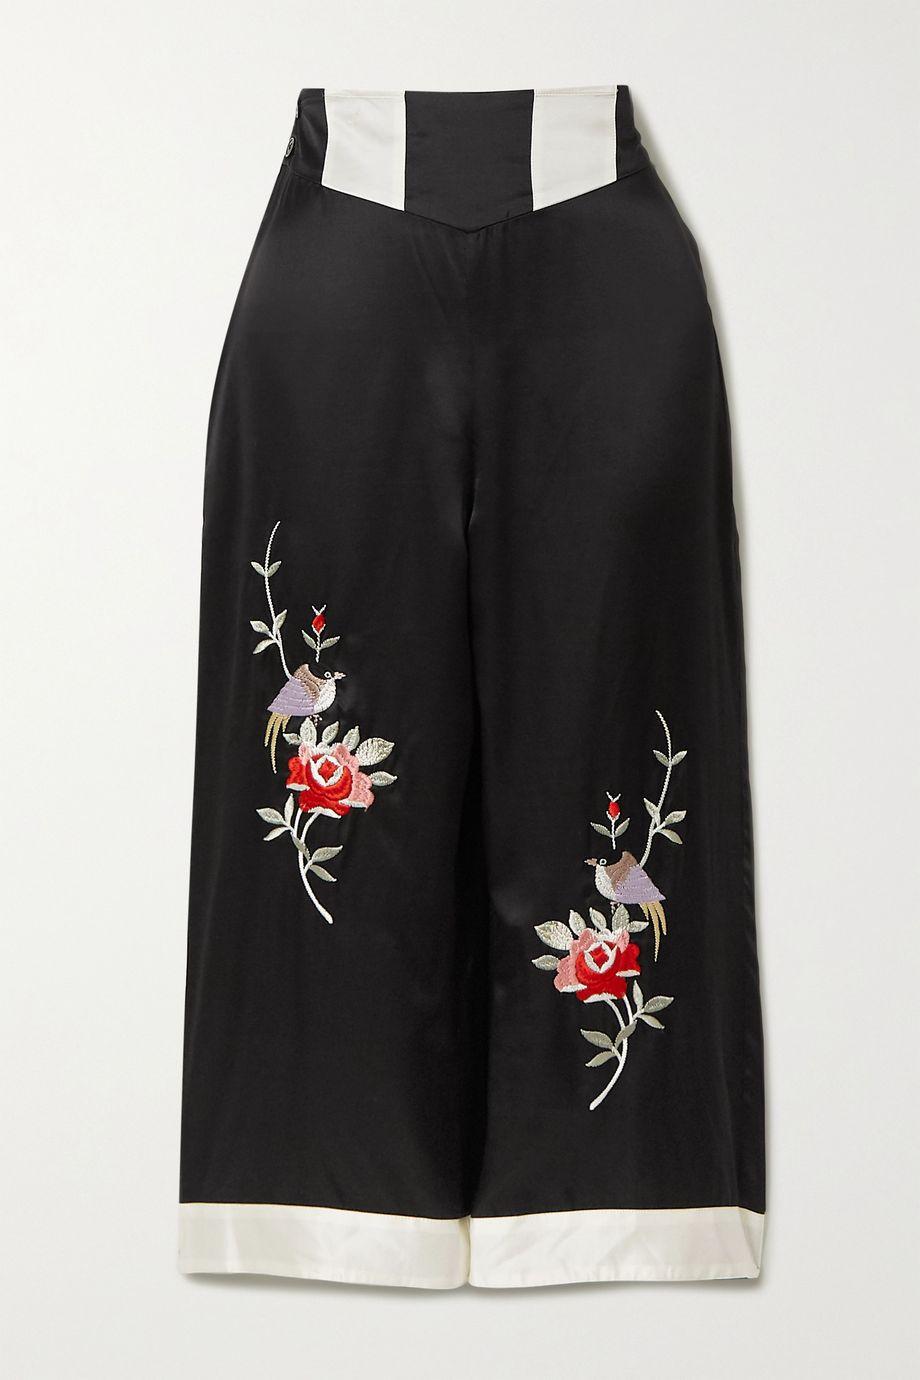 Morgan Lane Olive 刺绣缎布九分睡裤